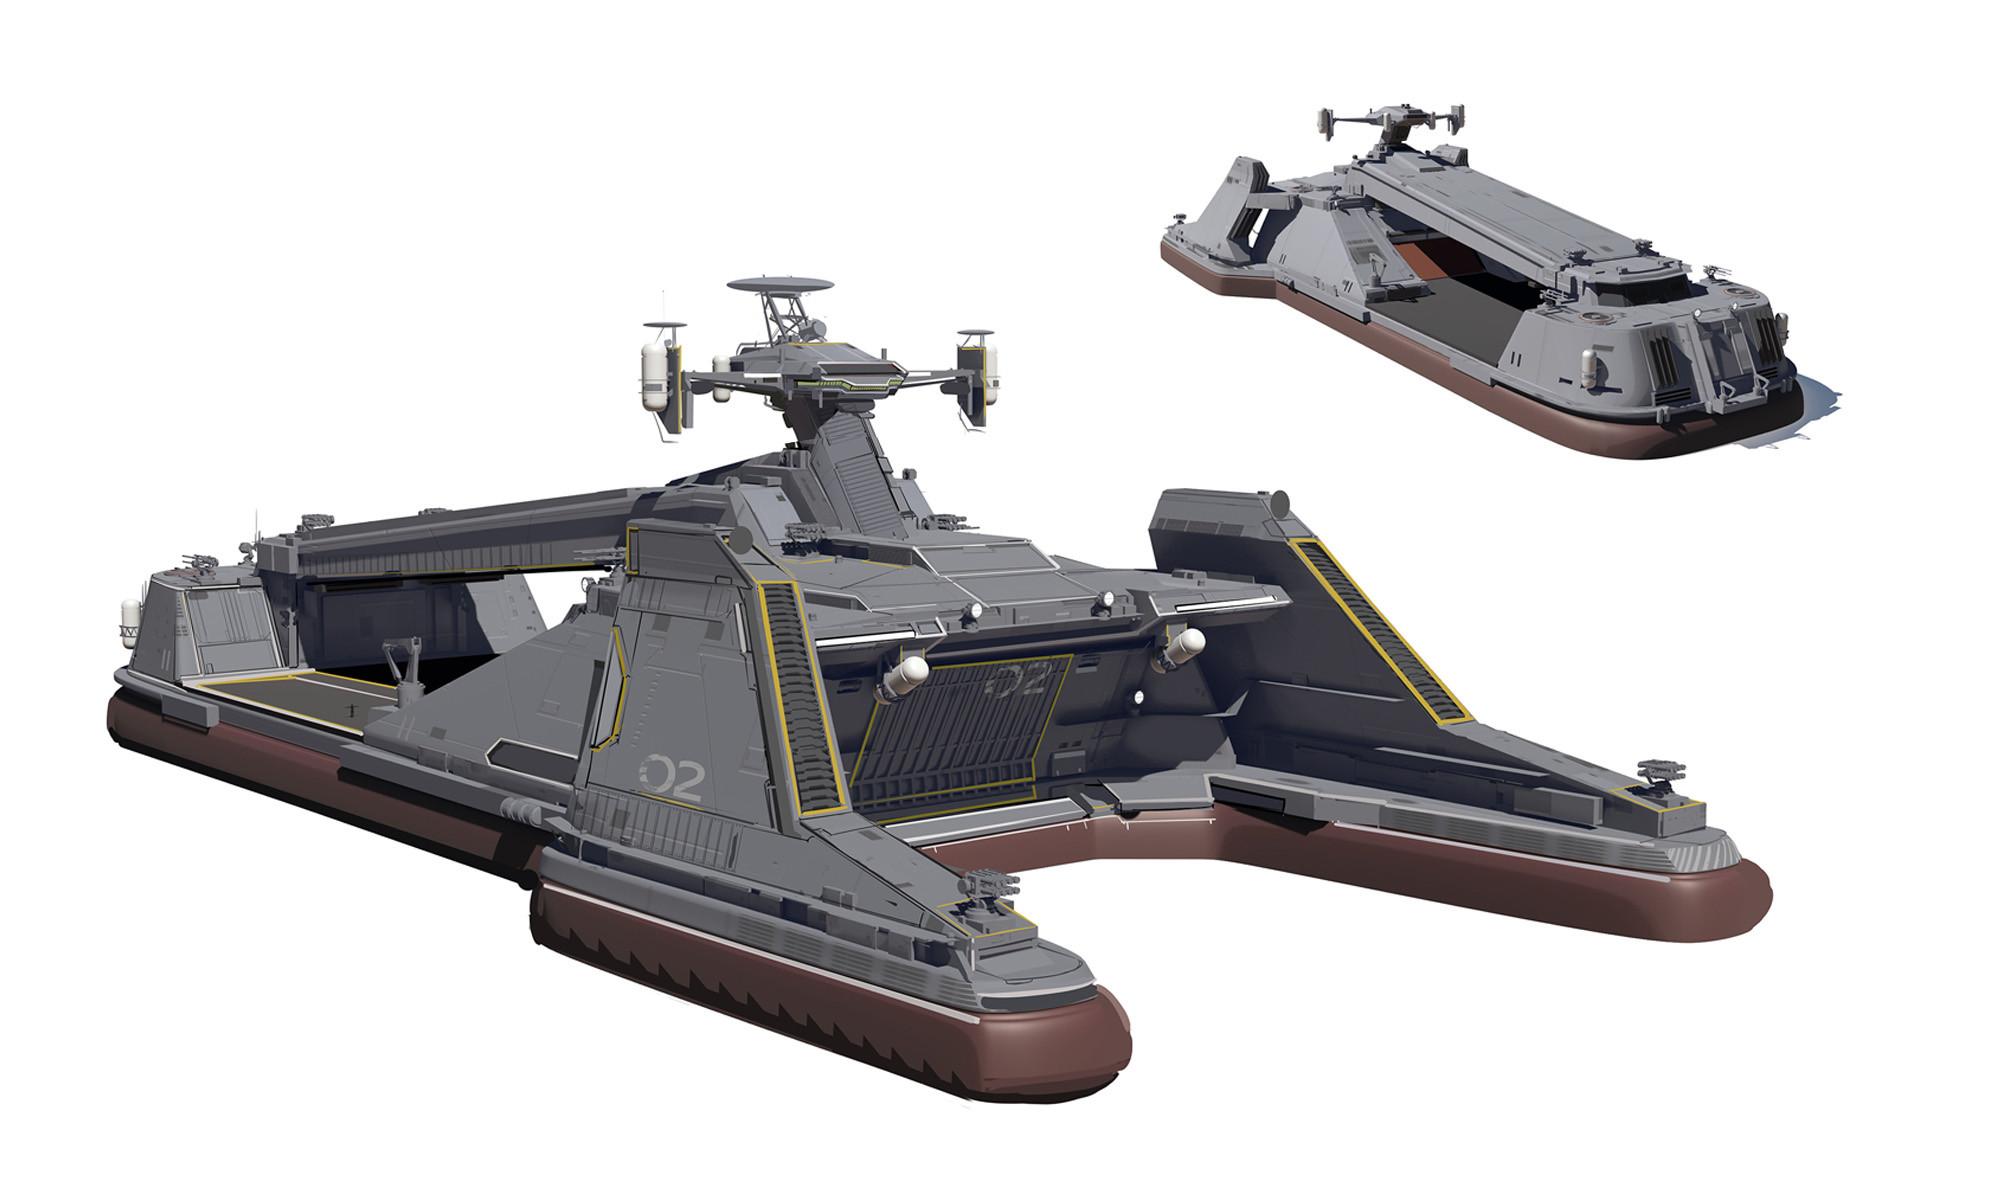 Hover carrier rough design